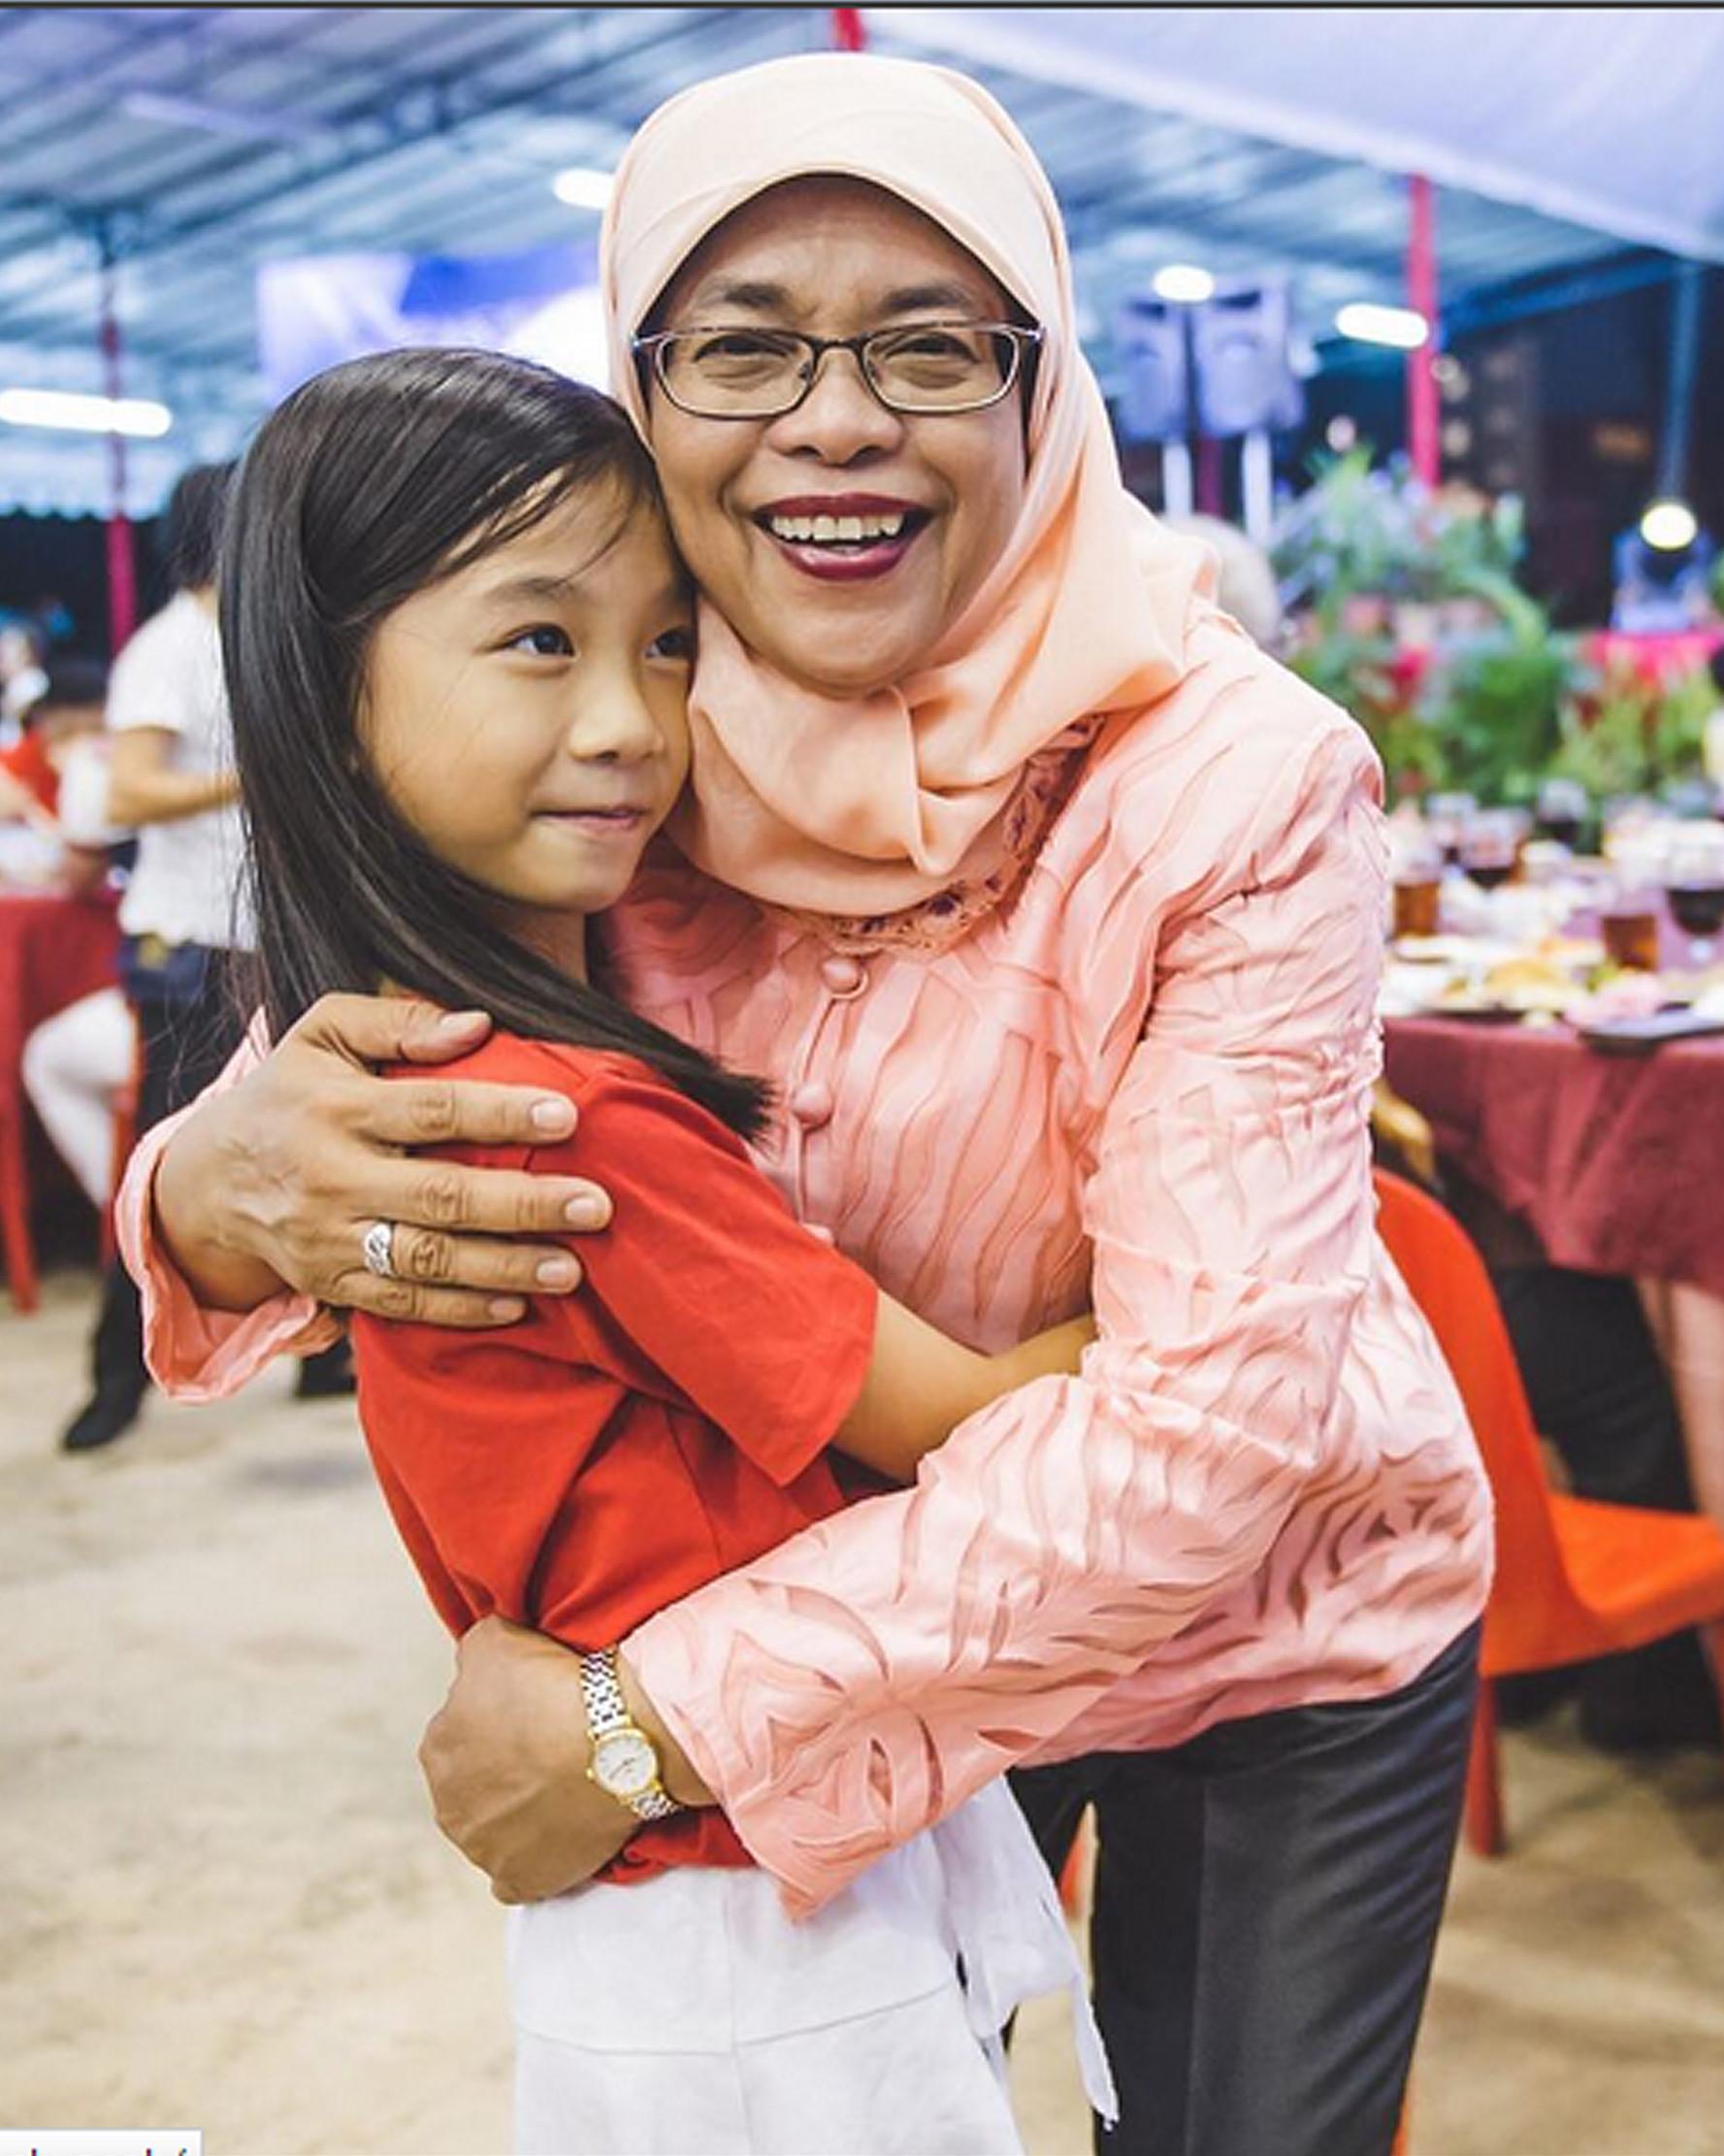 Riko (9 tahun) mendatangai Halimah Yacob untuk meminta tanda tangan dan mengucapkan terima kasih sambil memeluk, Singapura (14/8). (instagram.com/halimahyacob)